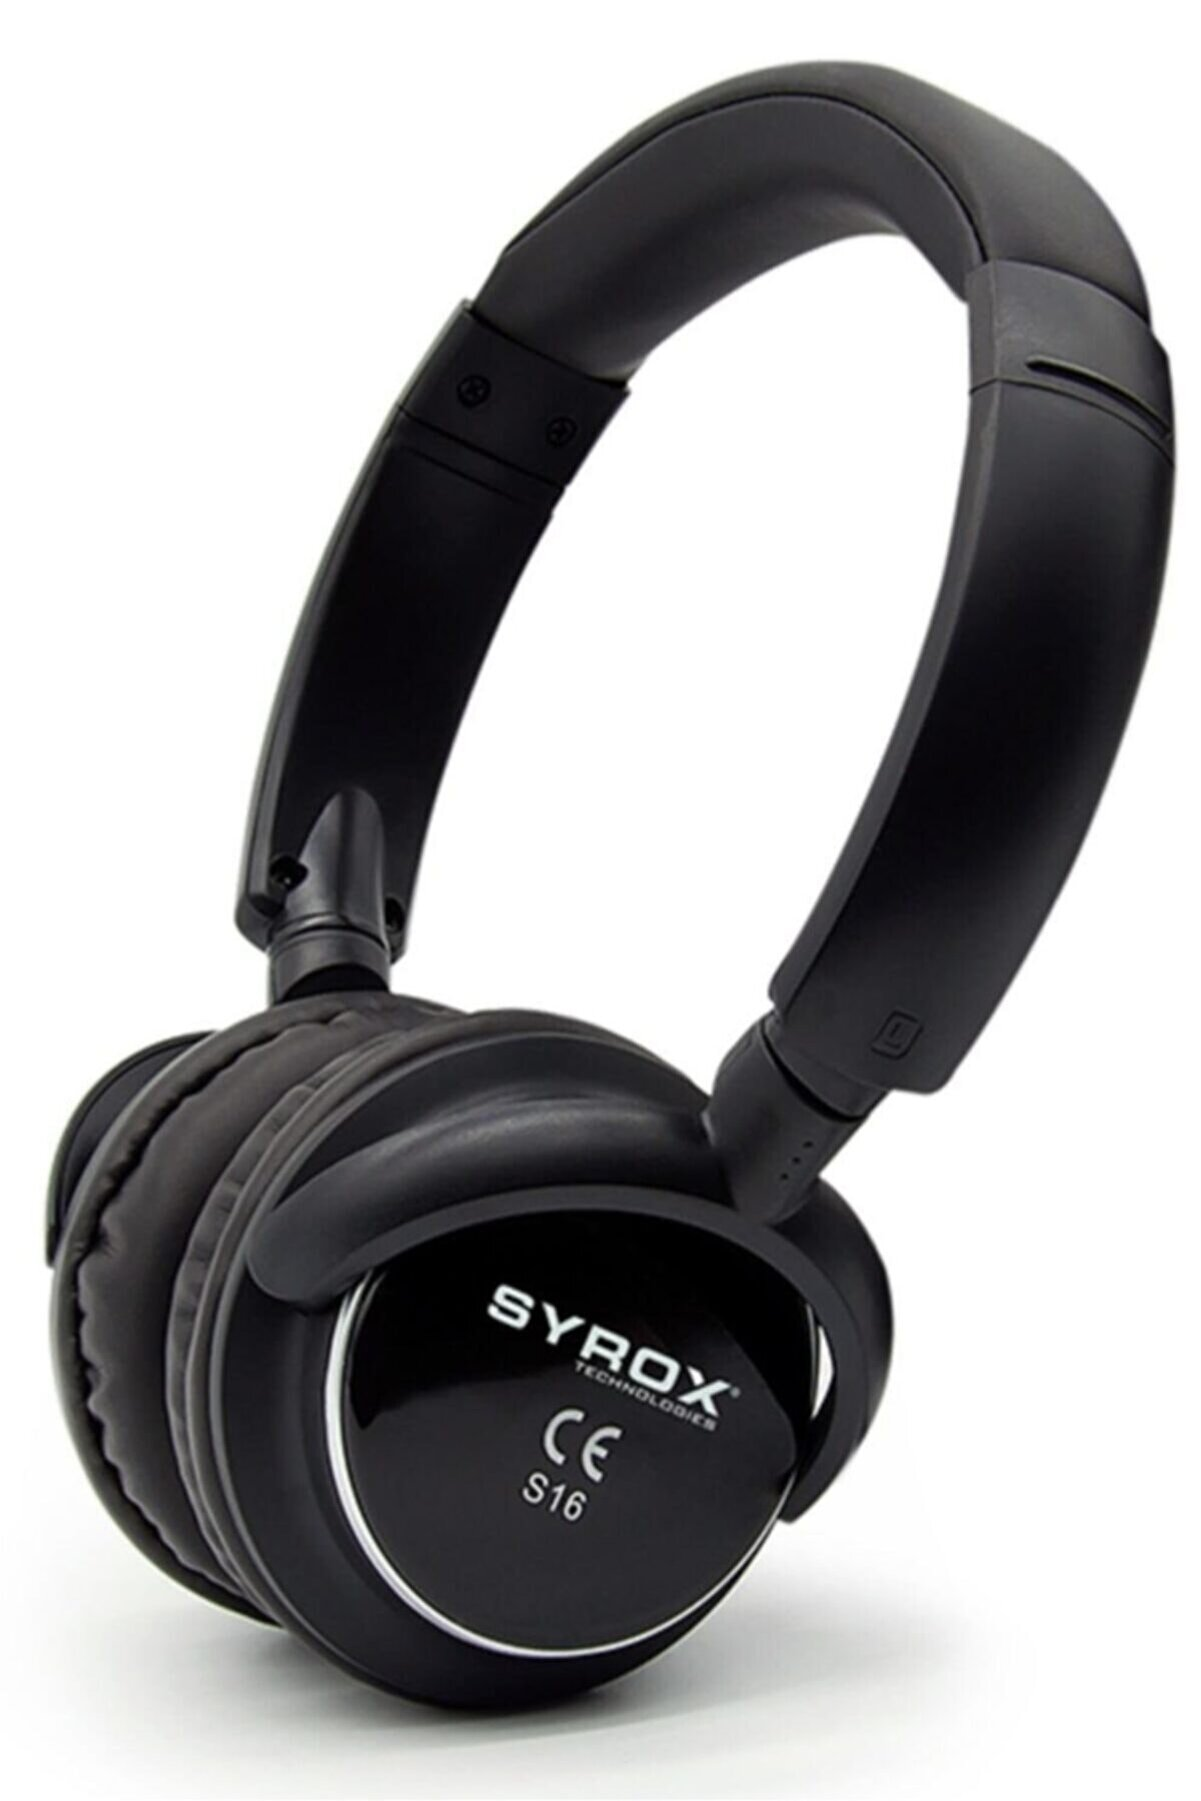 Syrox Siyah J-84 As16 16 Bluetooth 4 Fonksiyonlu Kulak Üstü Kulaklık S16